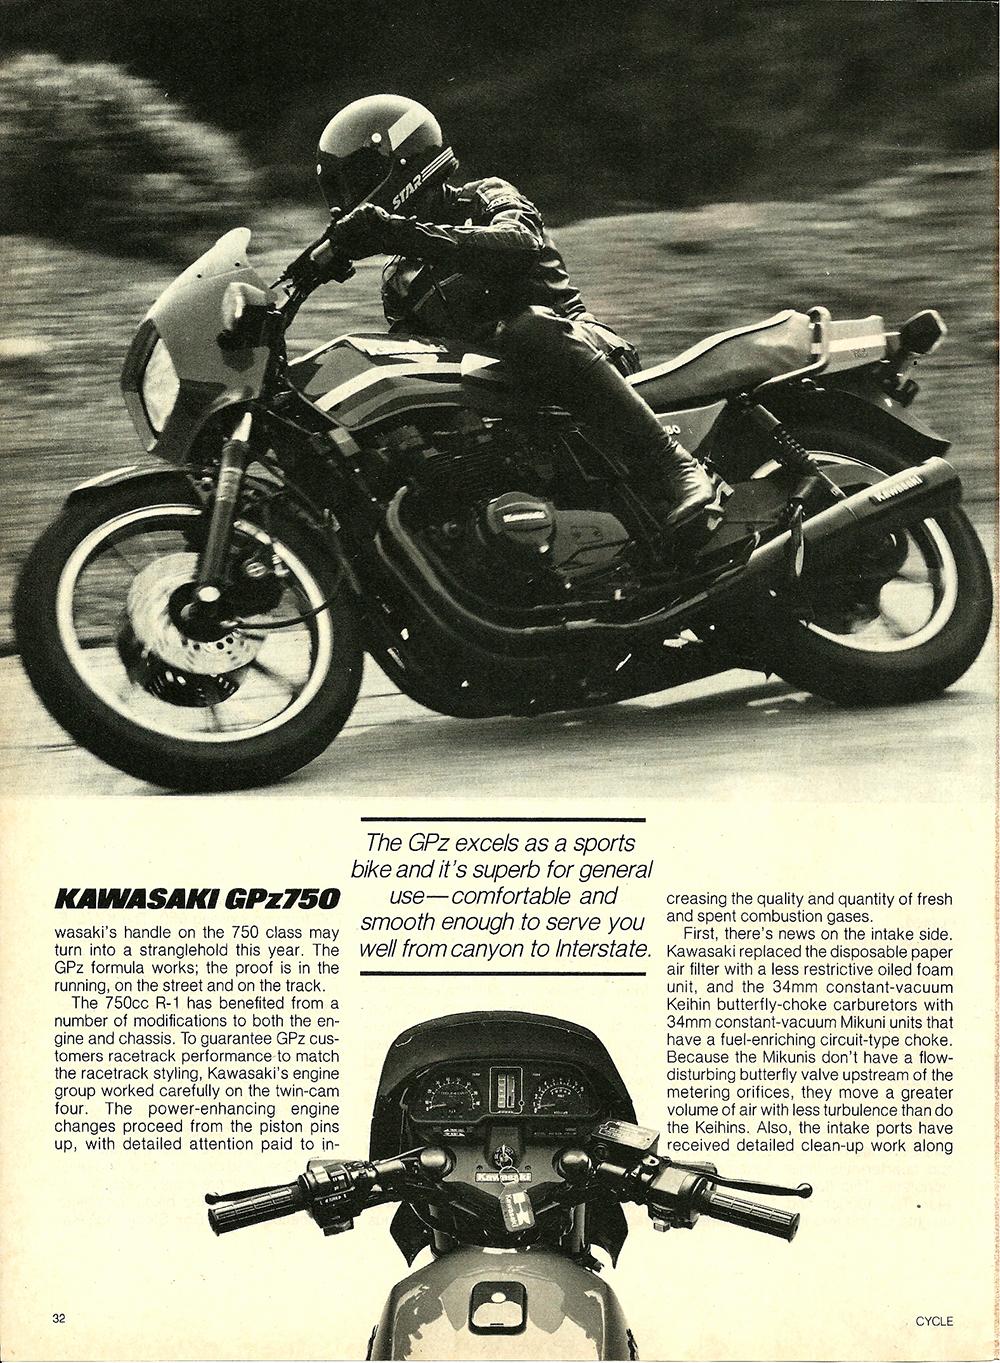 1982 Kawasaki Gpz750 road test 03.jpg